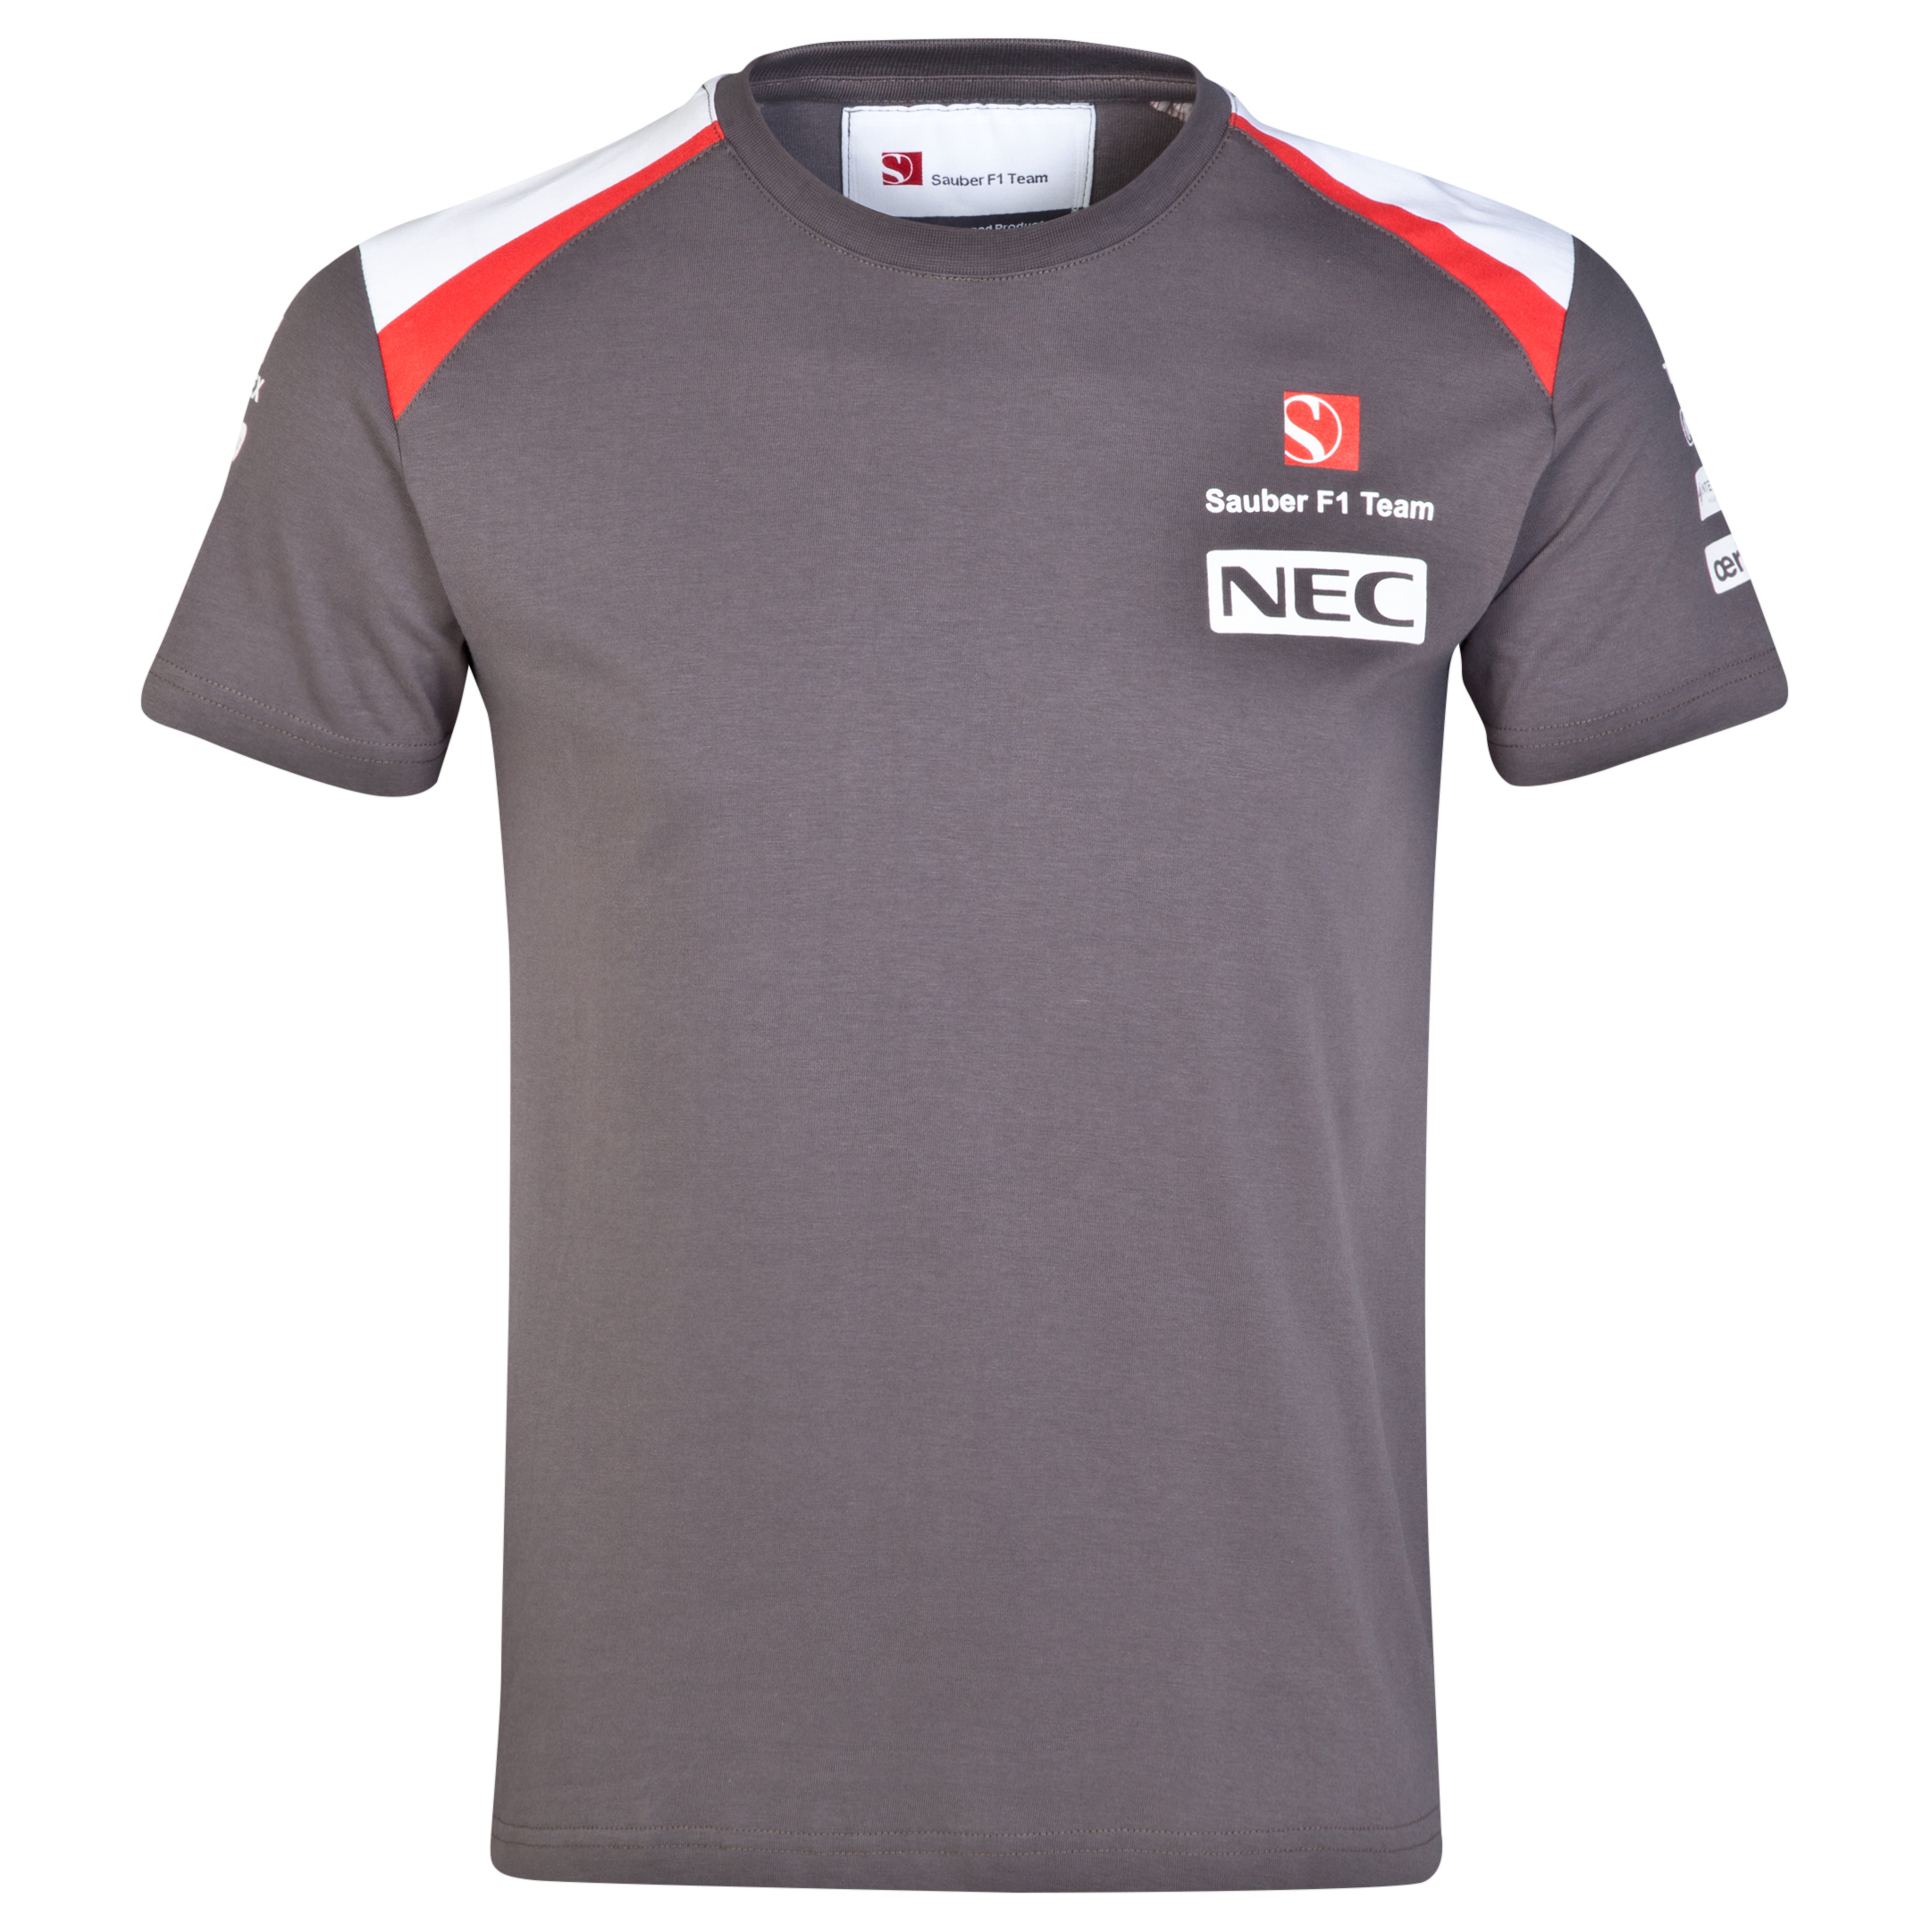 SAUBER F1 Team Sponsor T-Shirt